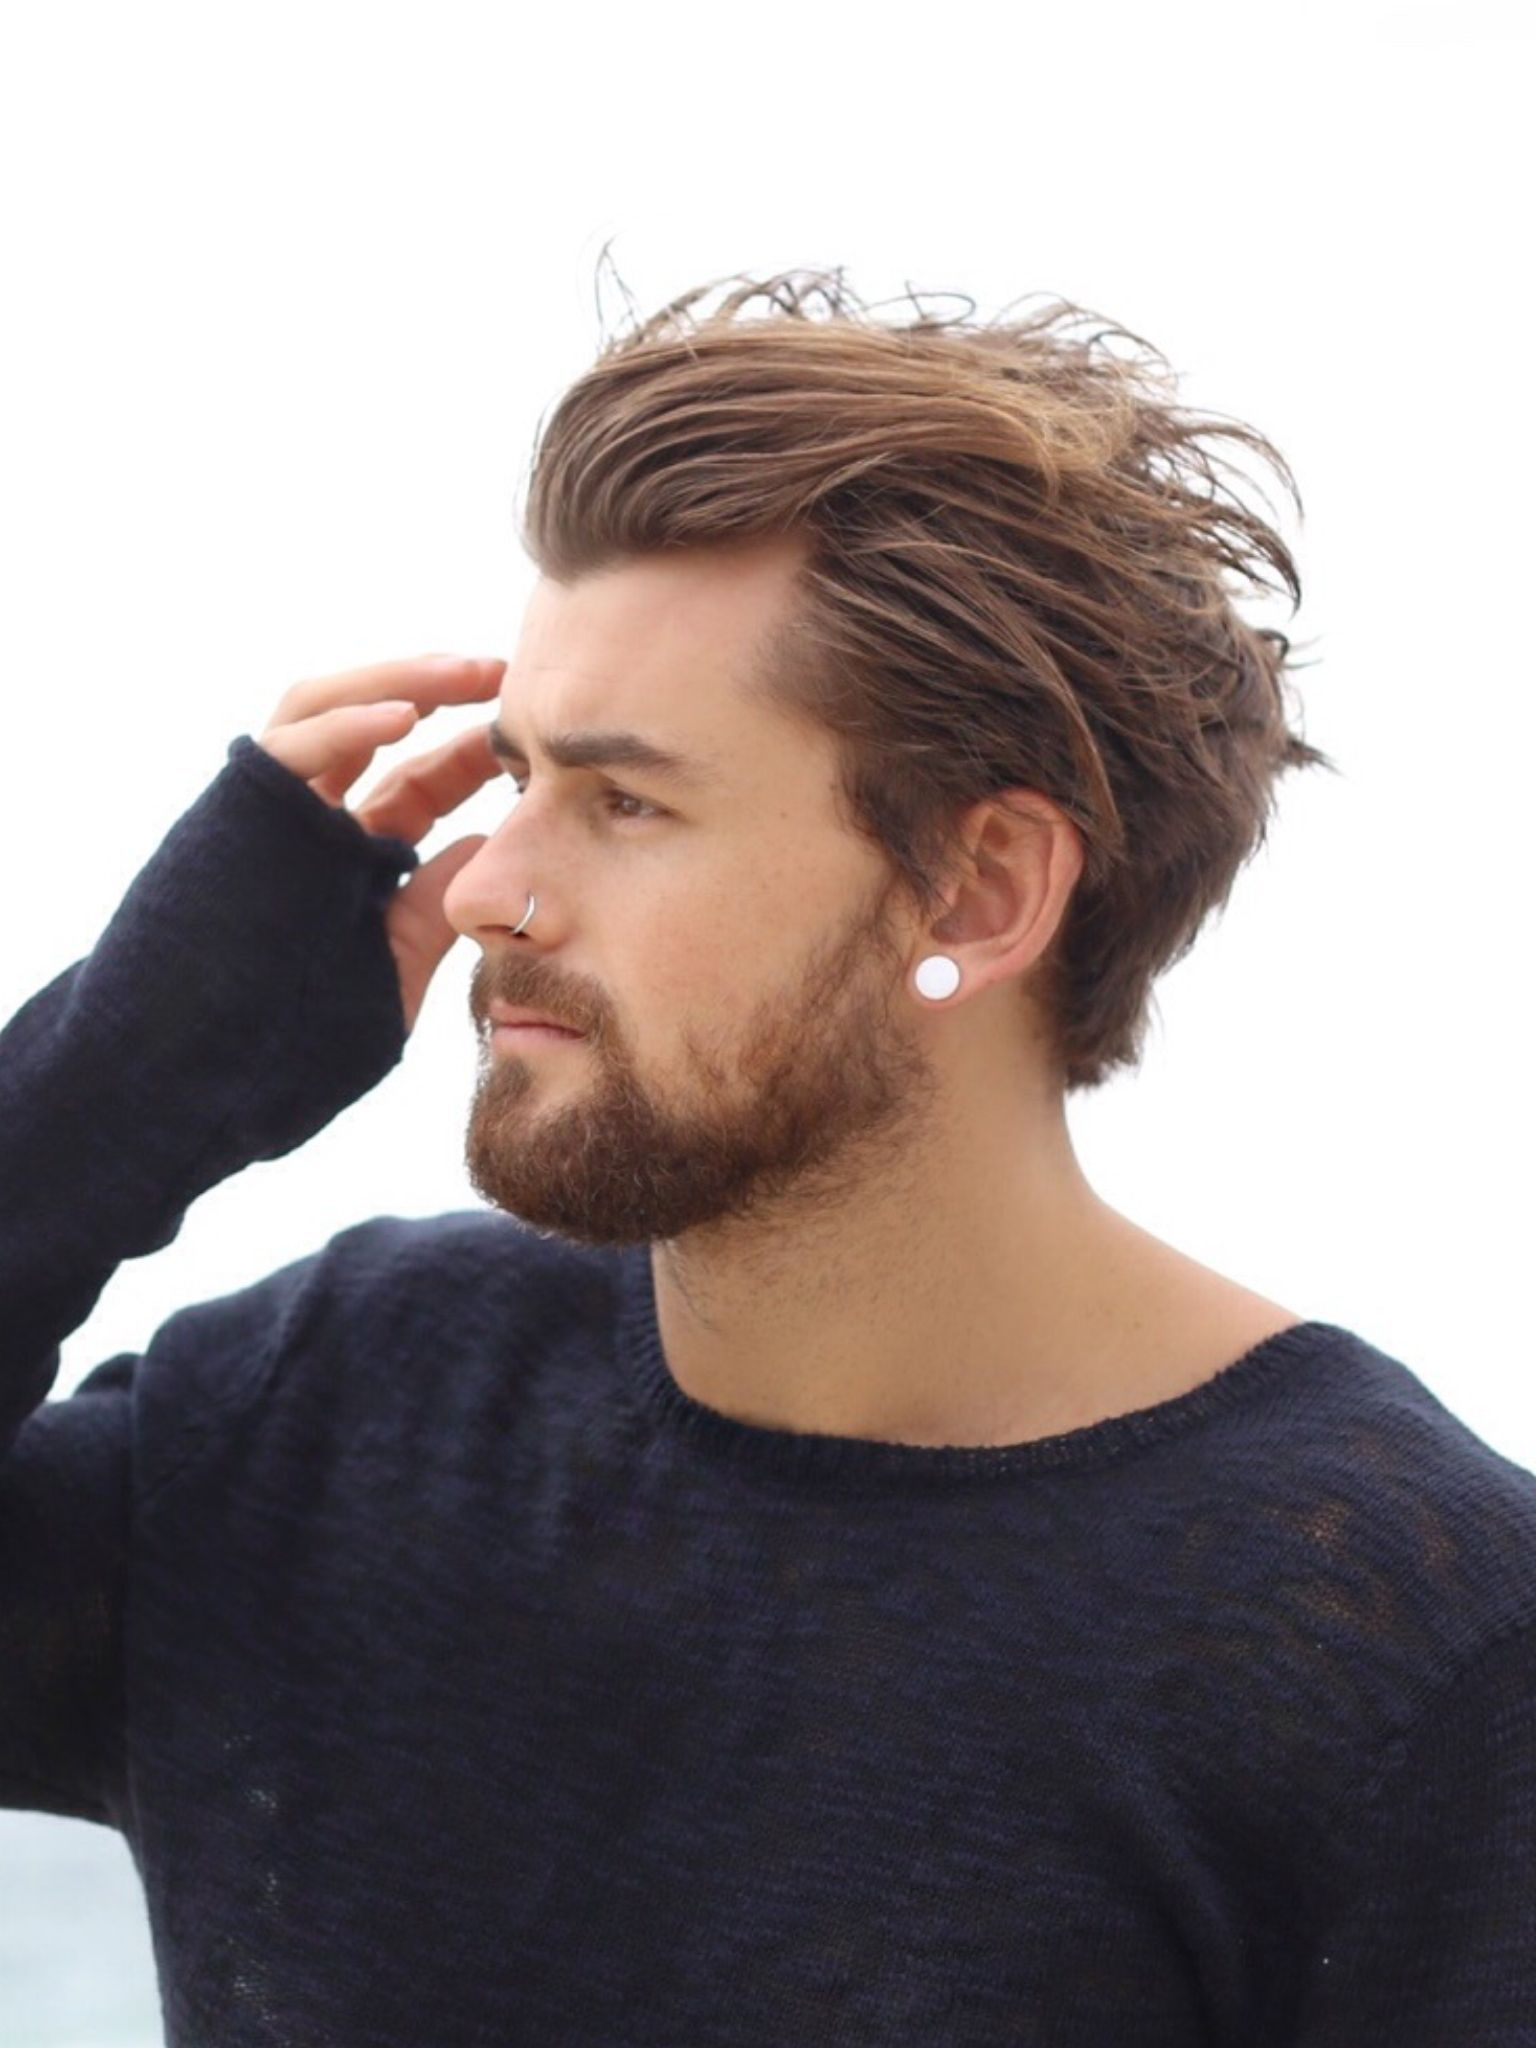 Männer Frisur Mens hairstyles Pinterest